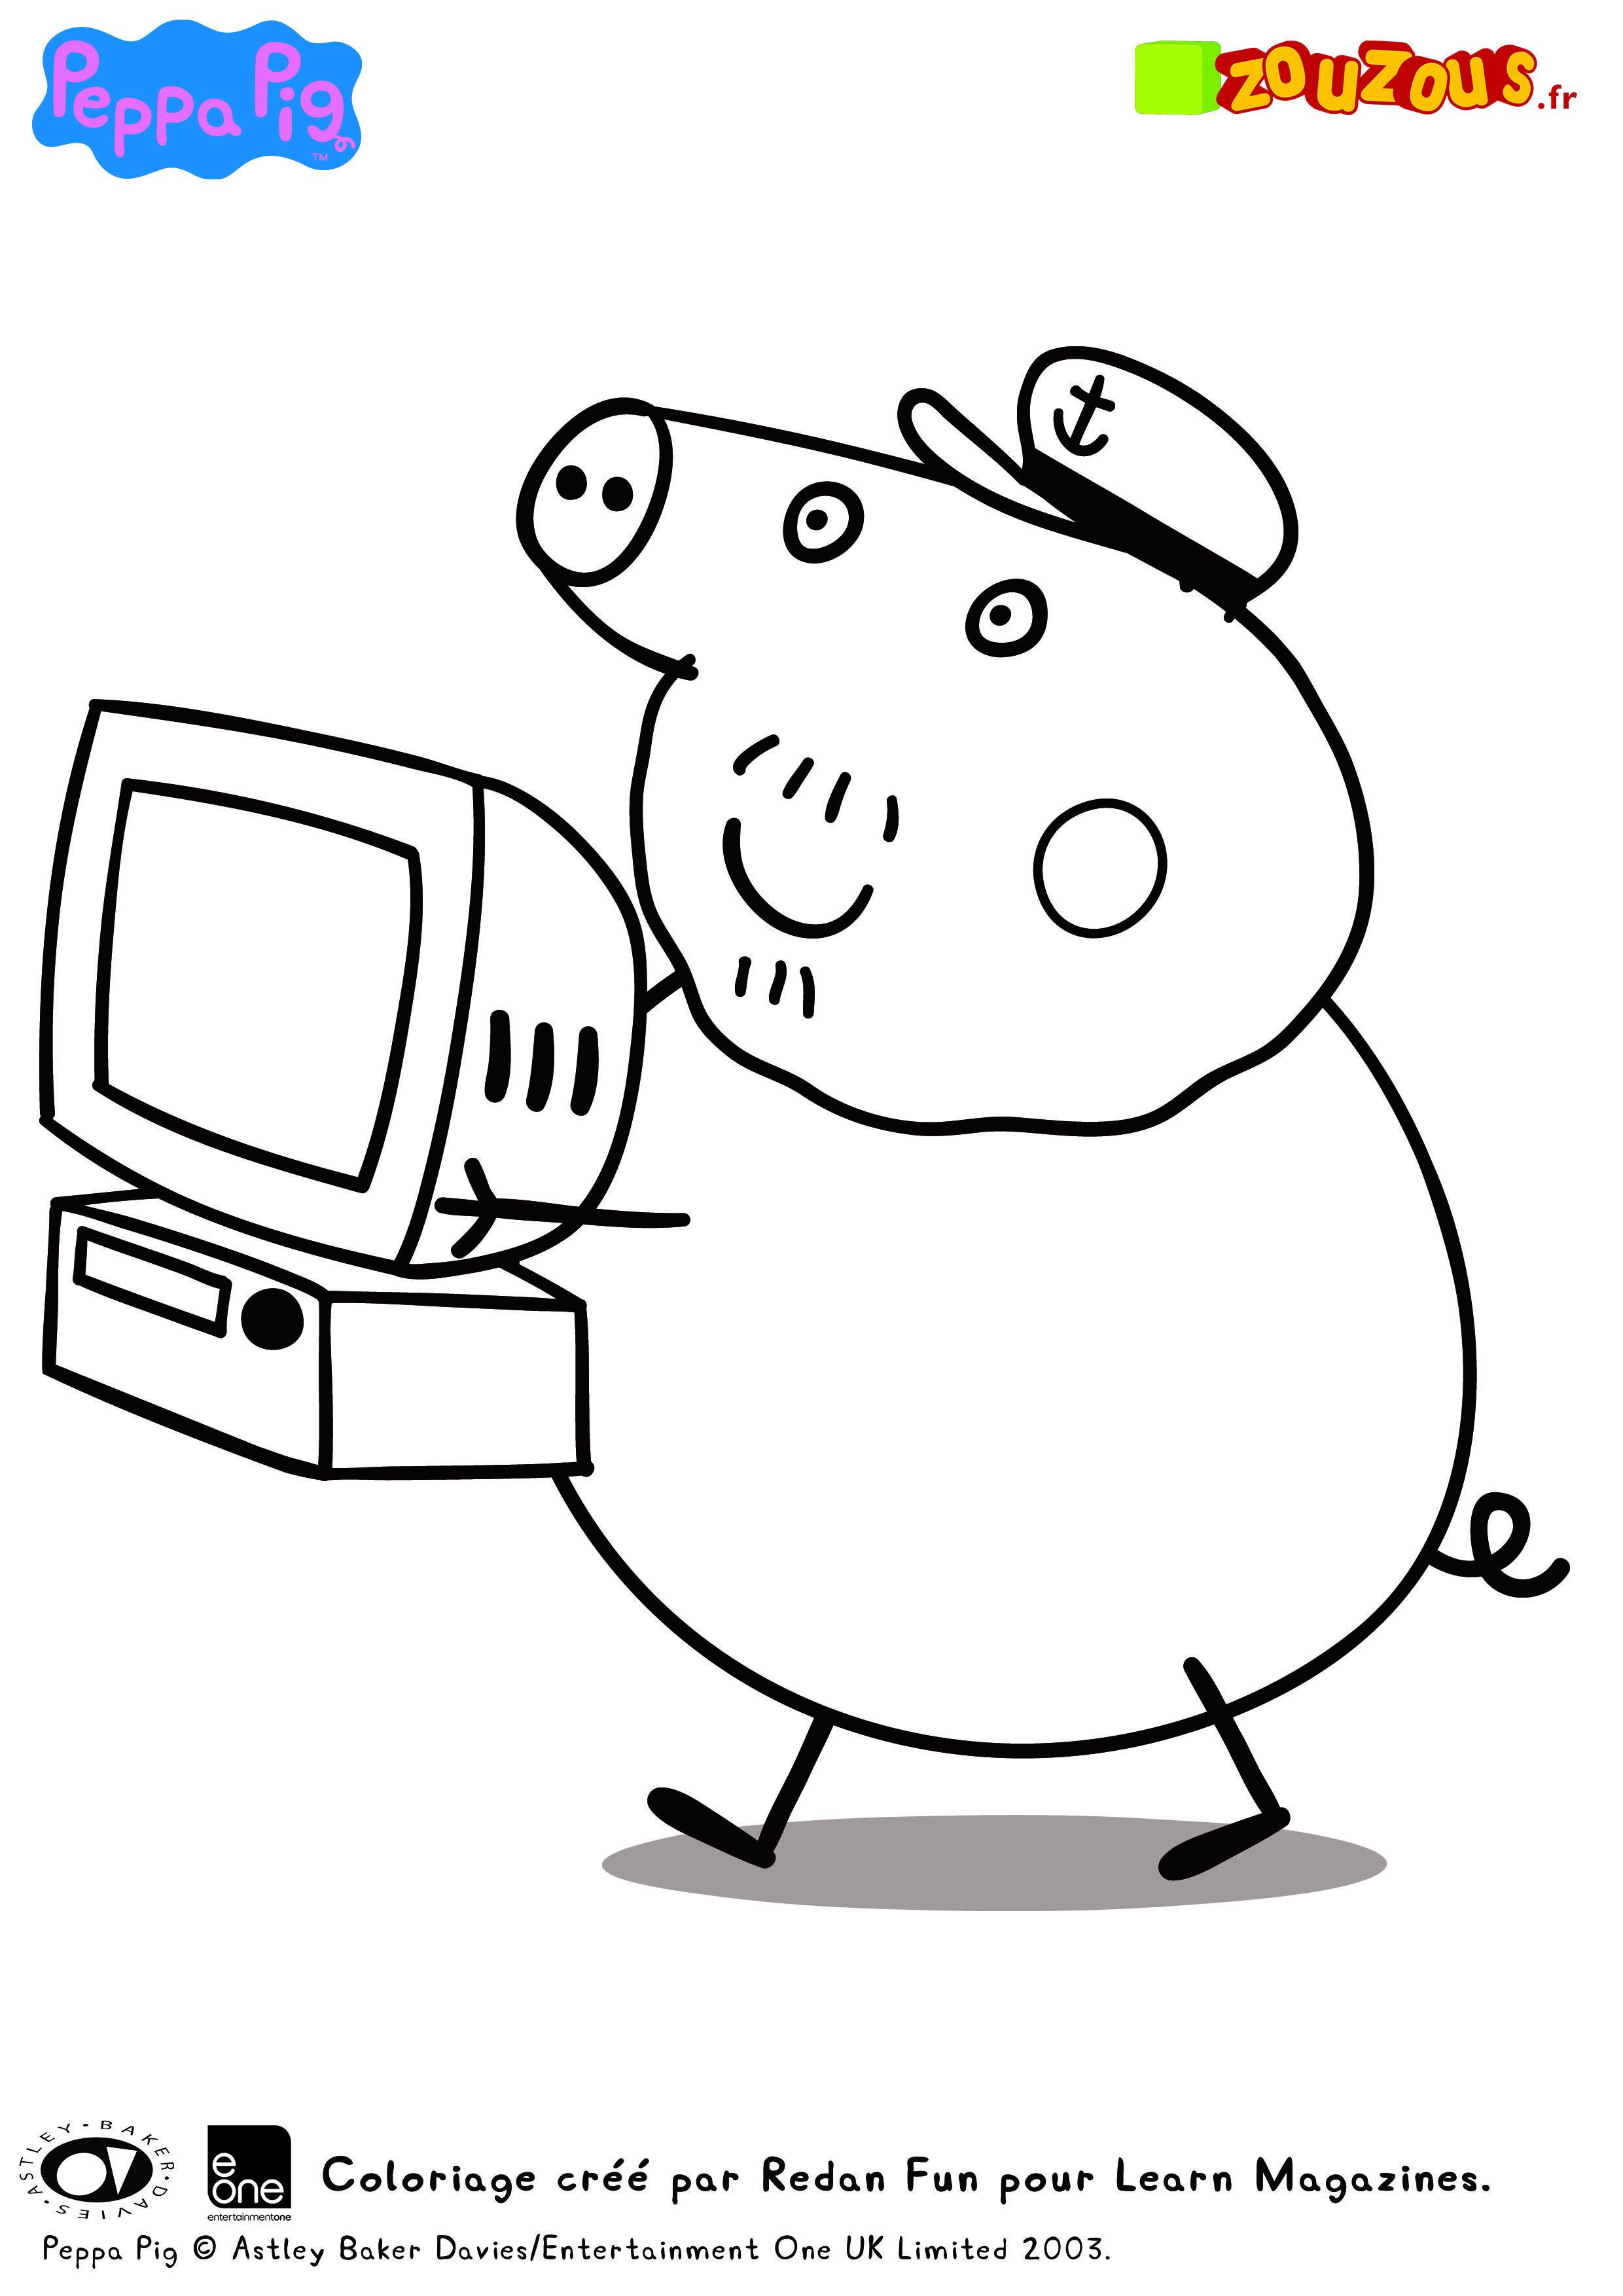 Pin de S en Peppa Pig | Pinterest